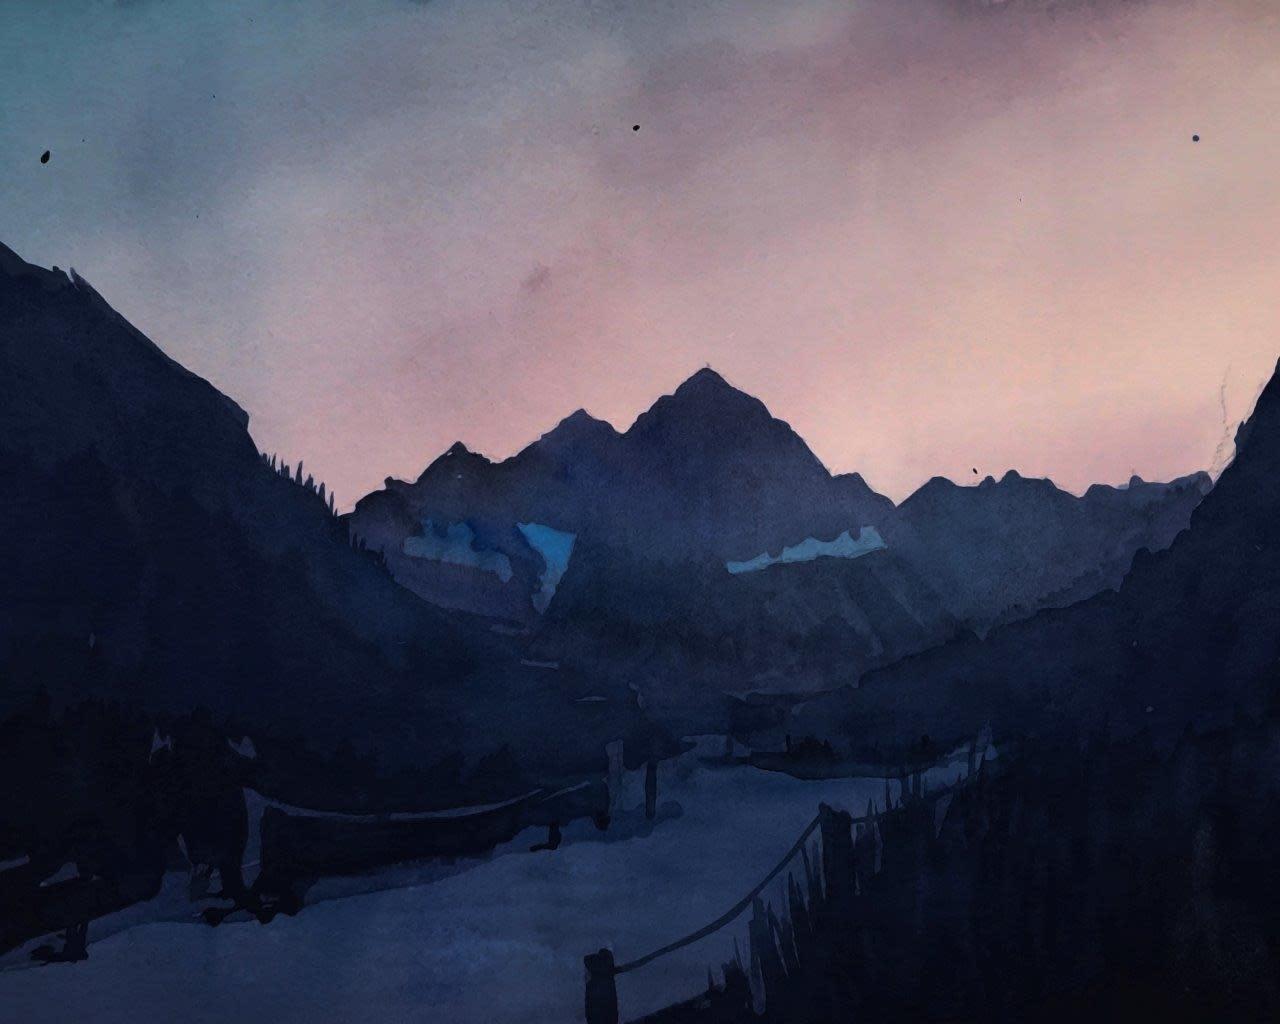 Mt aspen maroon bells dusk hpmgrl